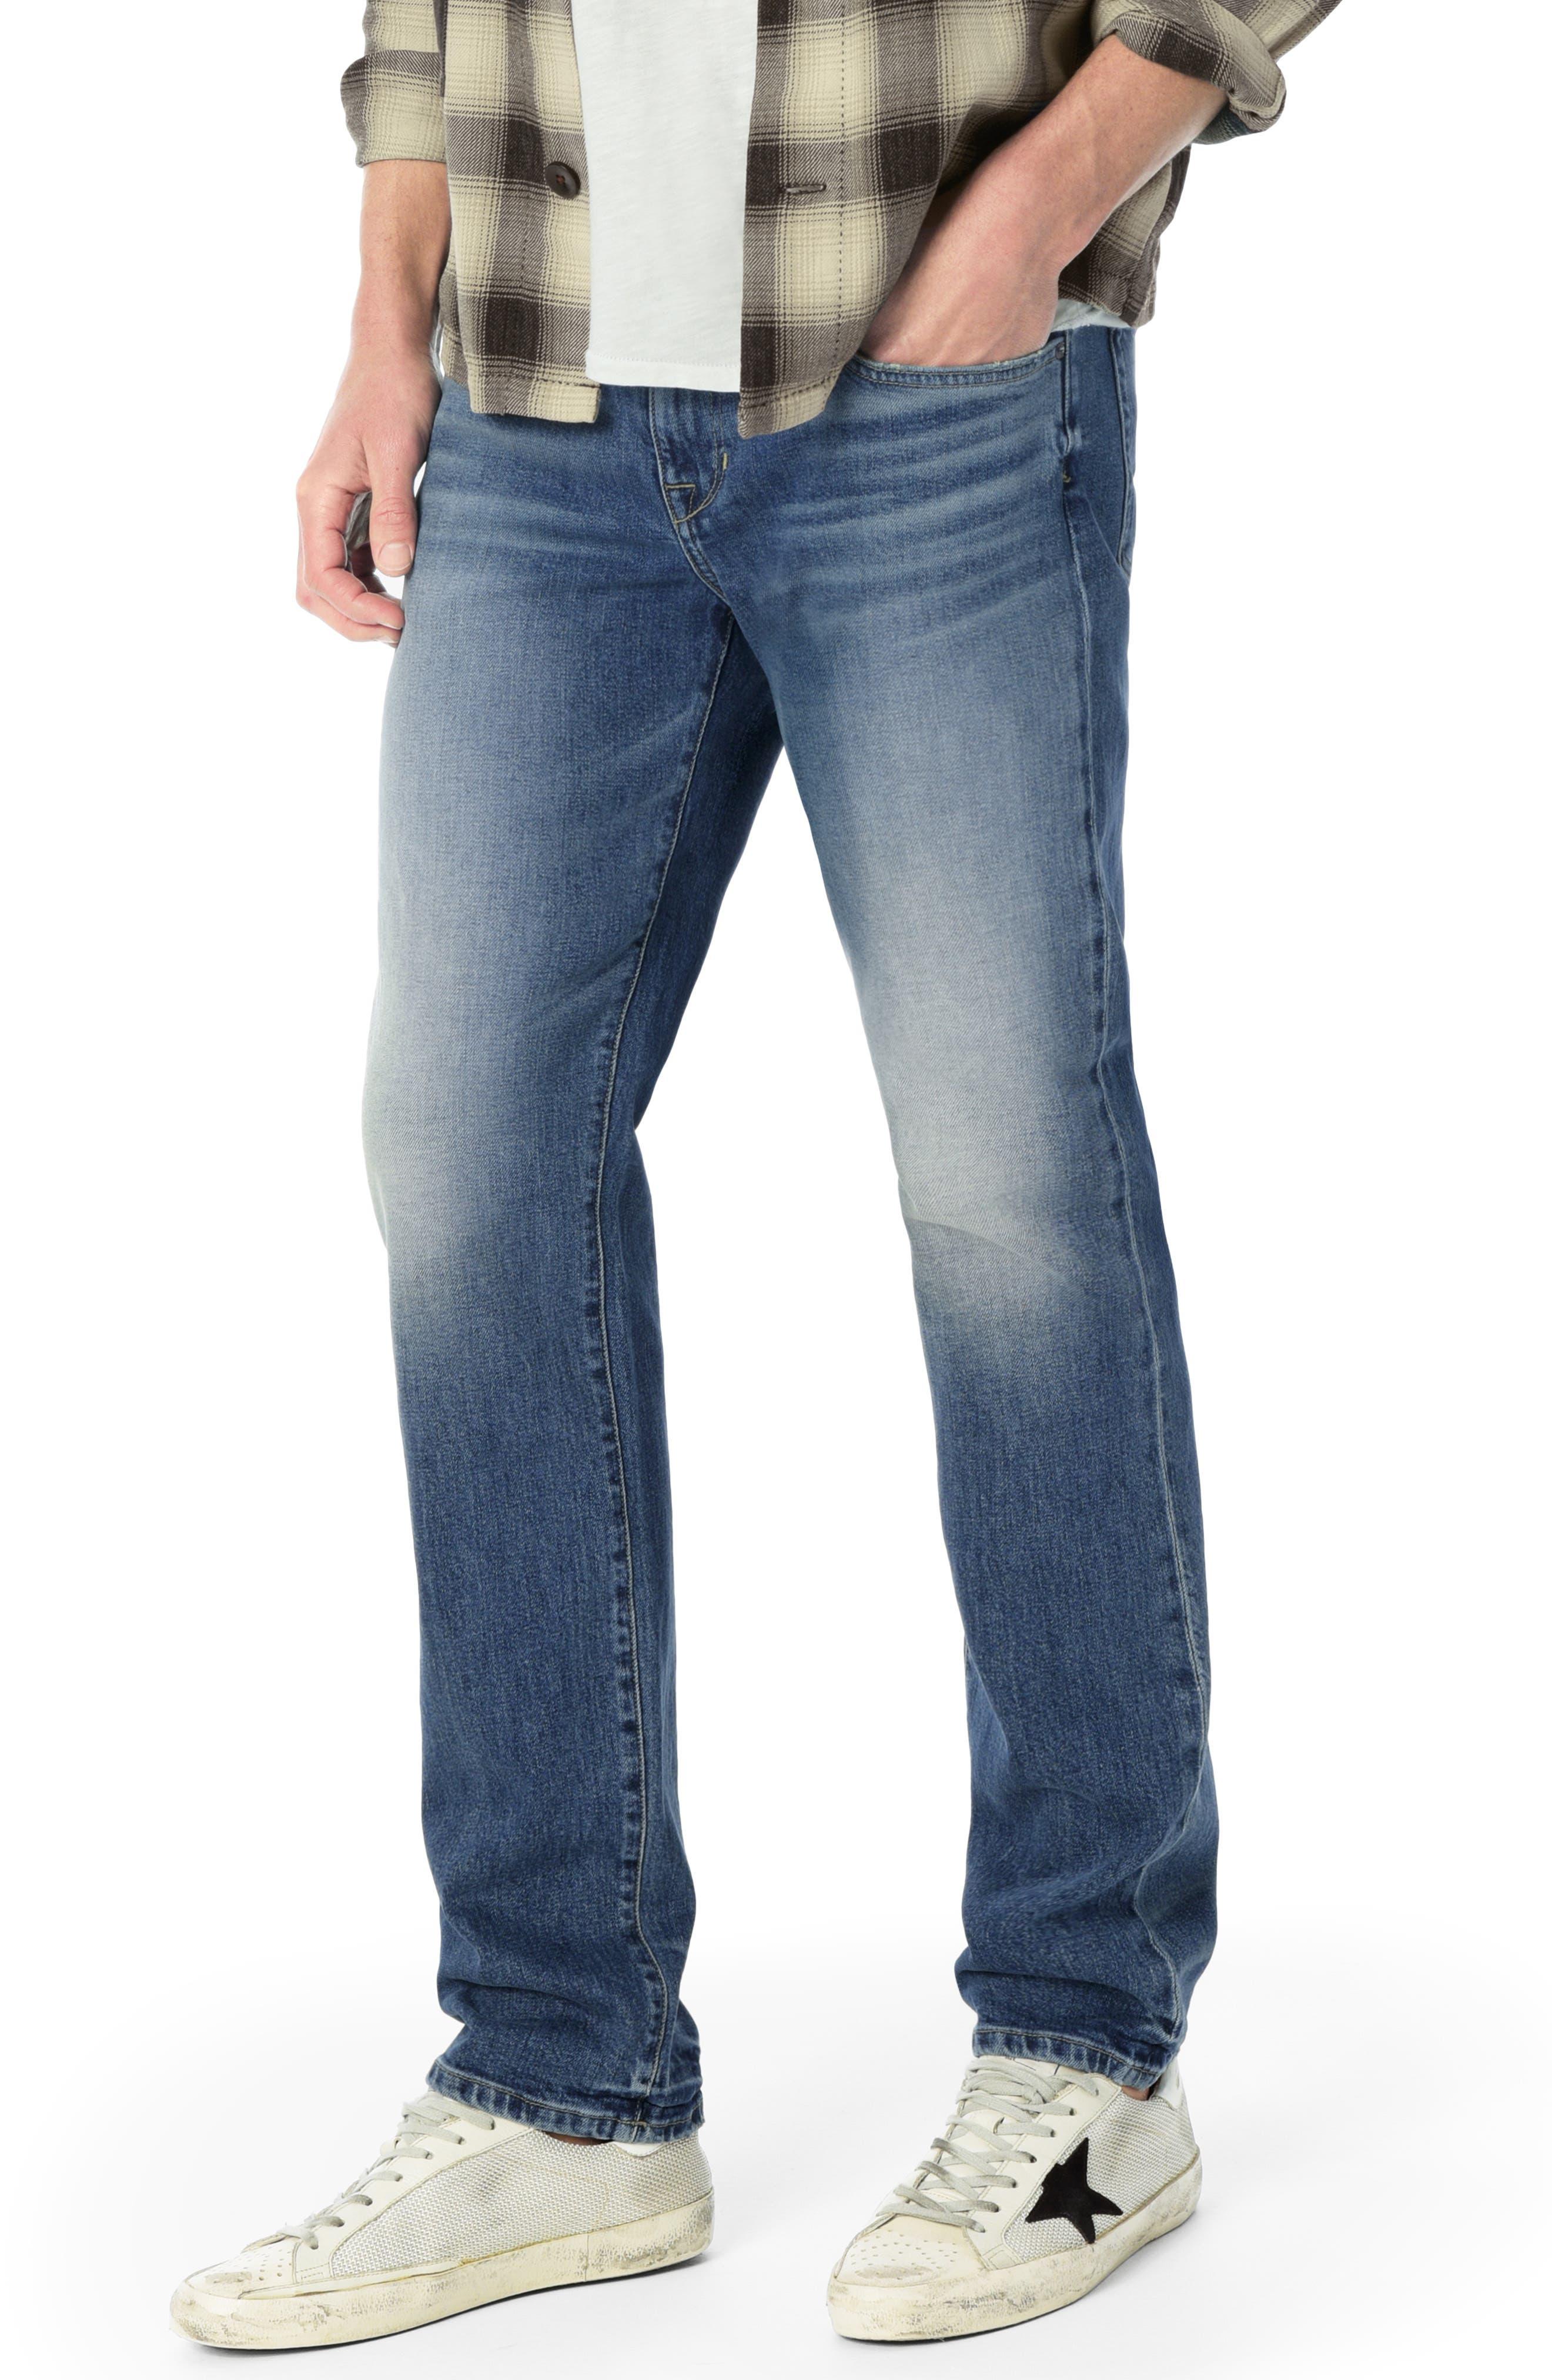 Brixton Slim Straight Leg Jeans,                             Main thumbnail 1, color,                             HARPO